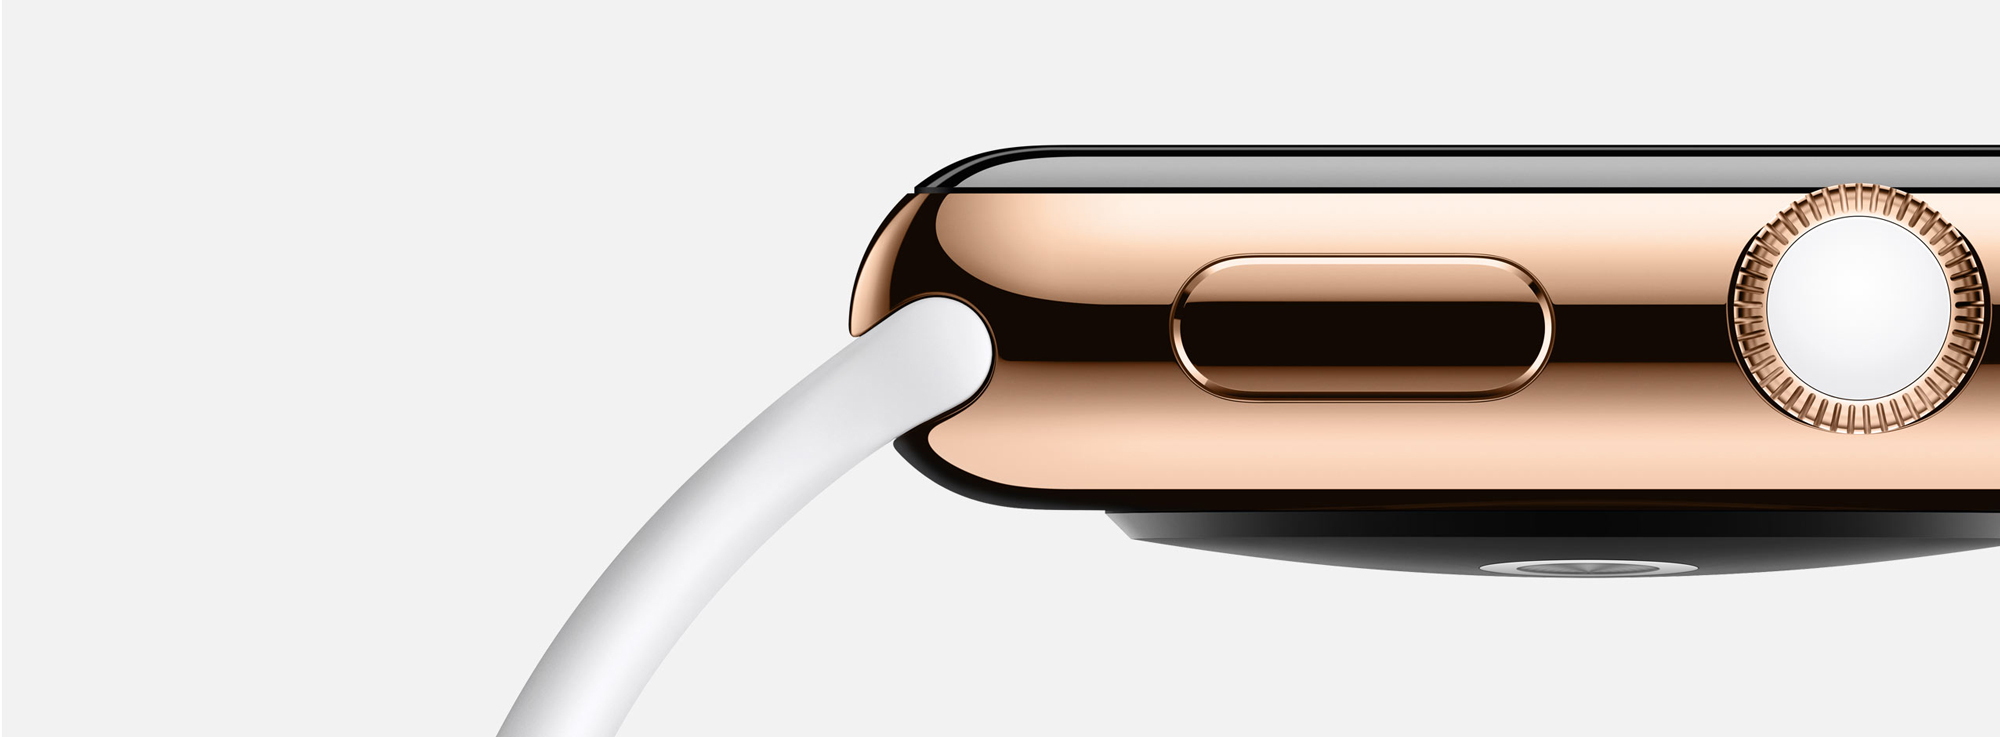 Apple-Watch-2015-hero-99